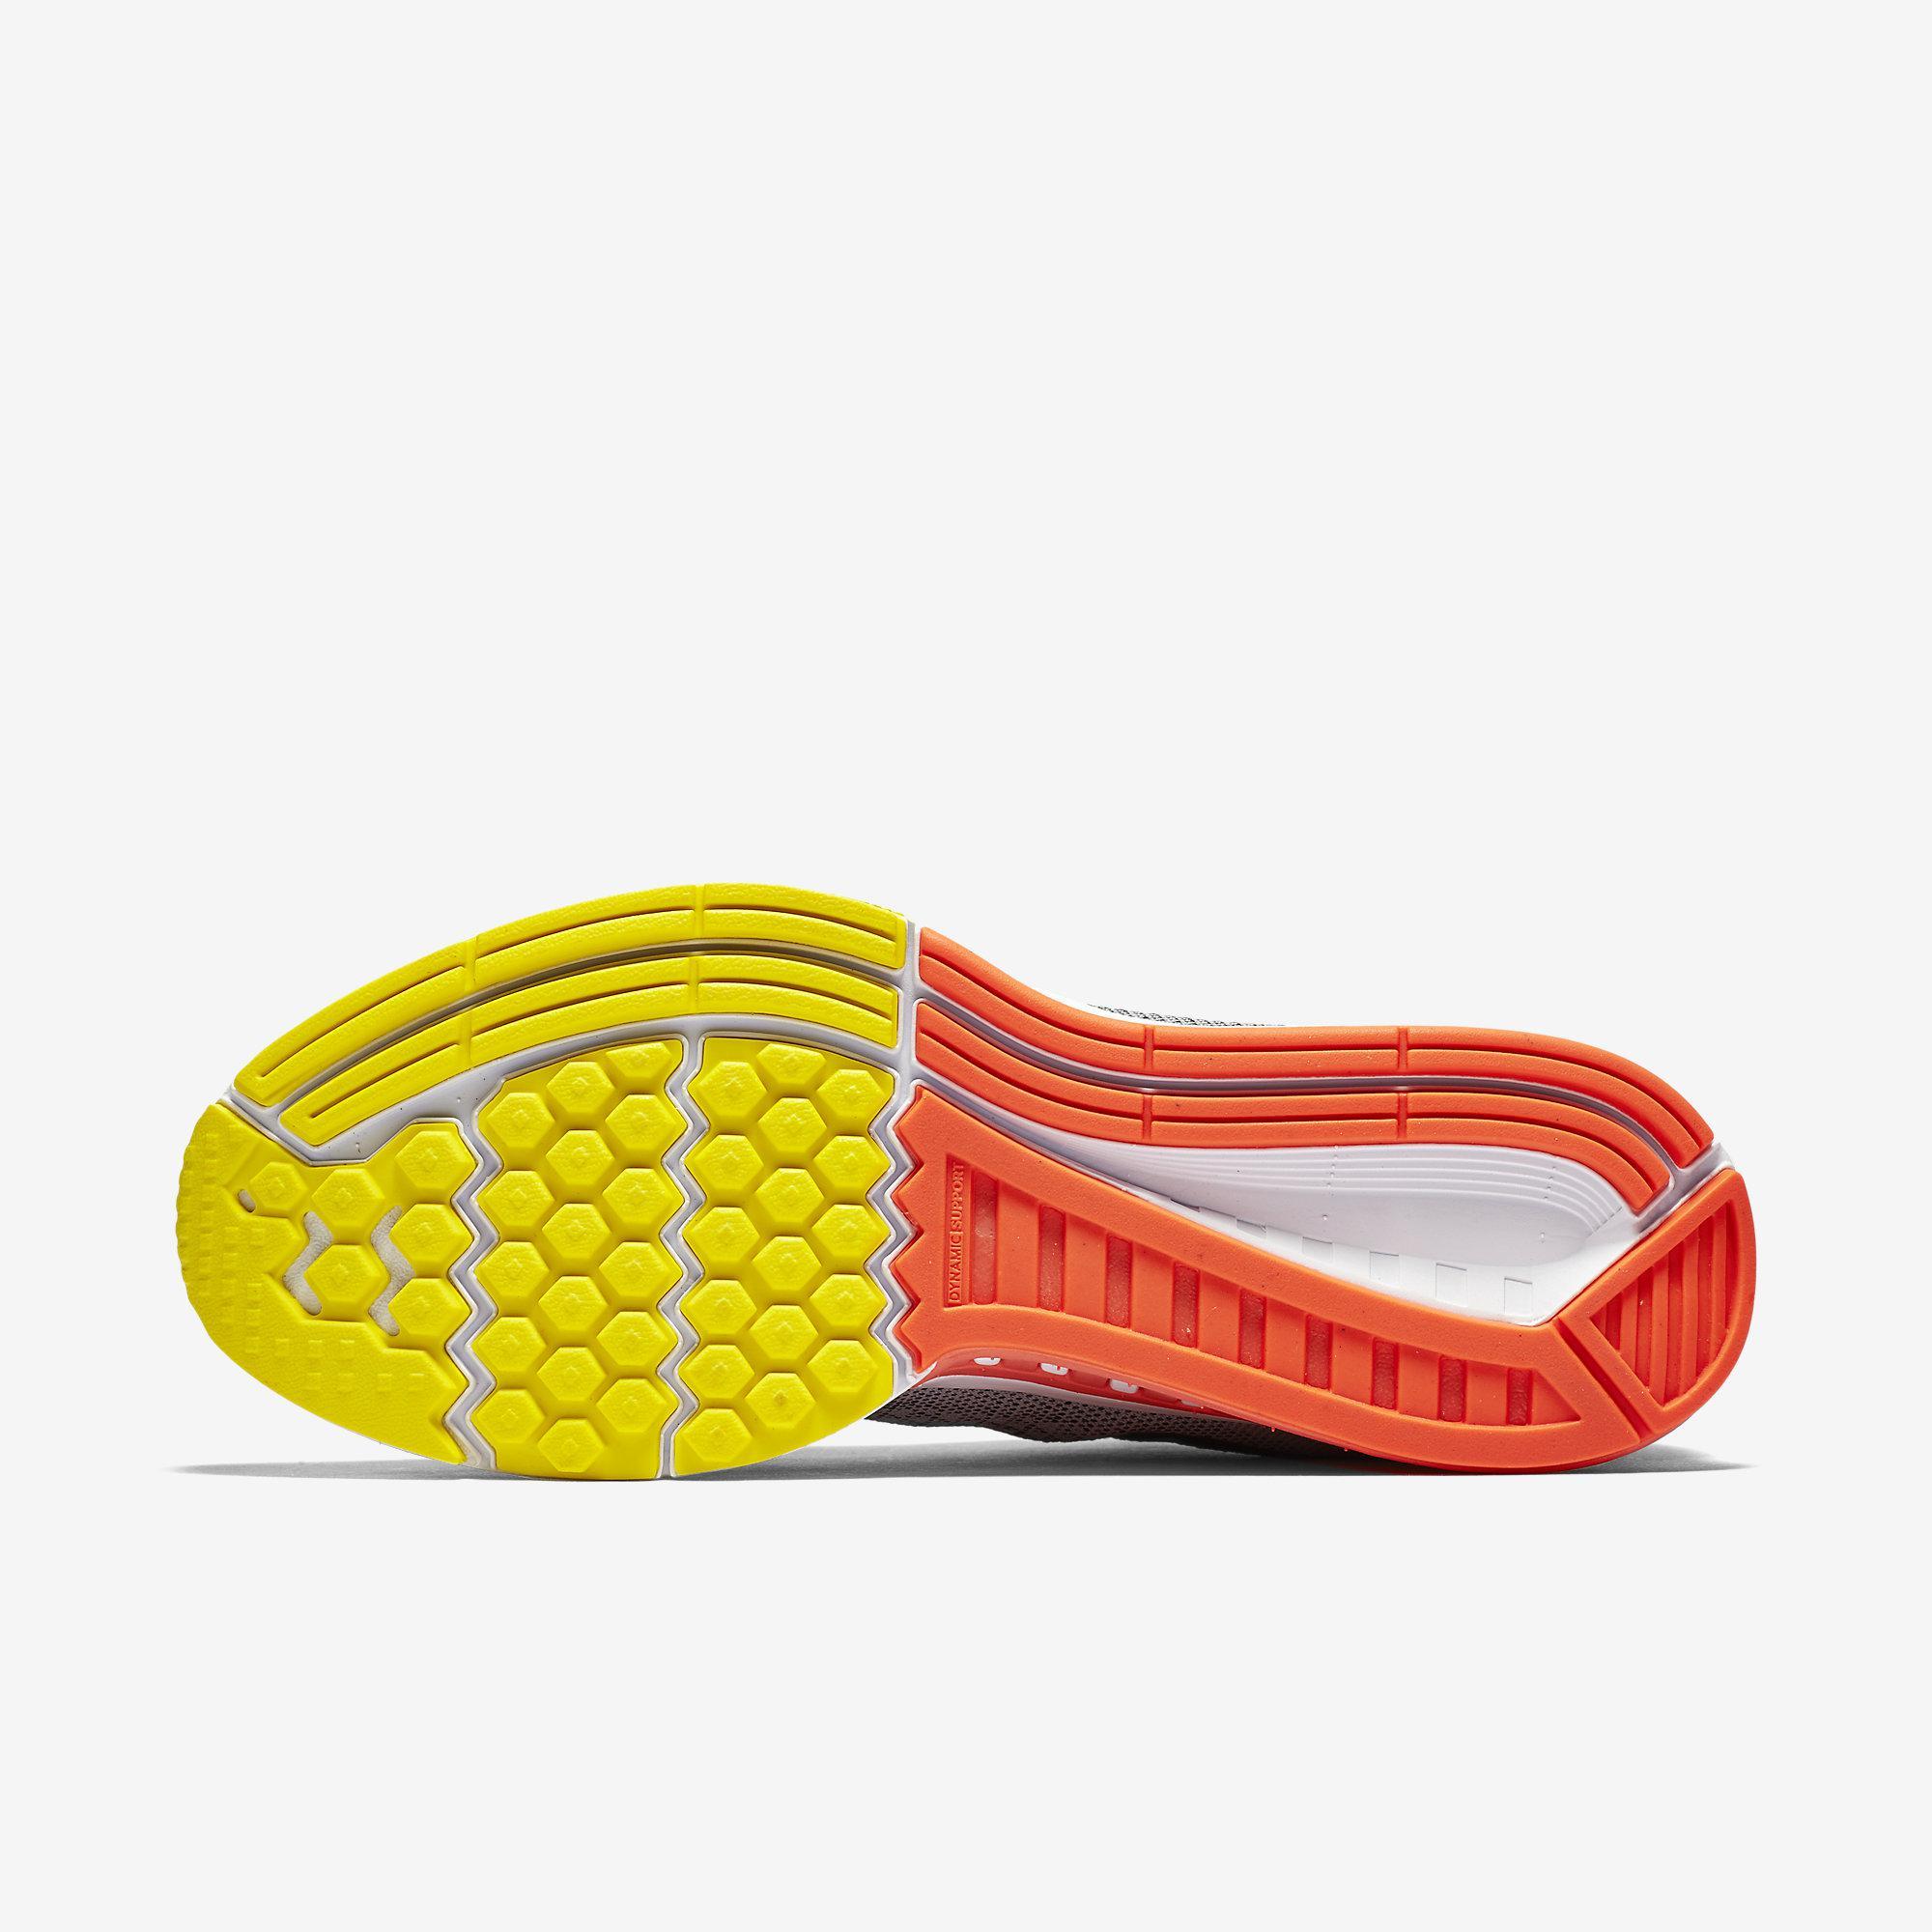 meet feb73 cf0e4 Nike Mens Air Zoom Structure 19 Running Shoes - Grey/Yellow